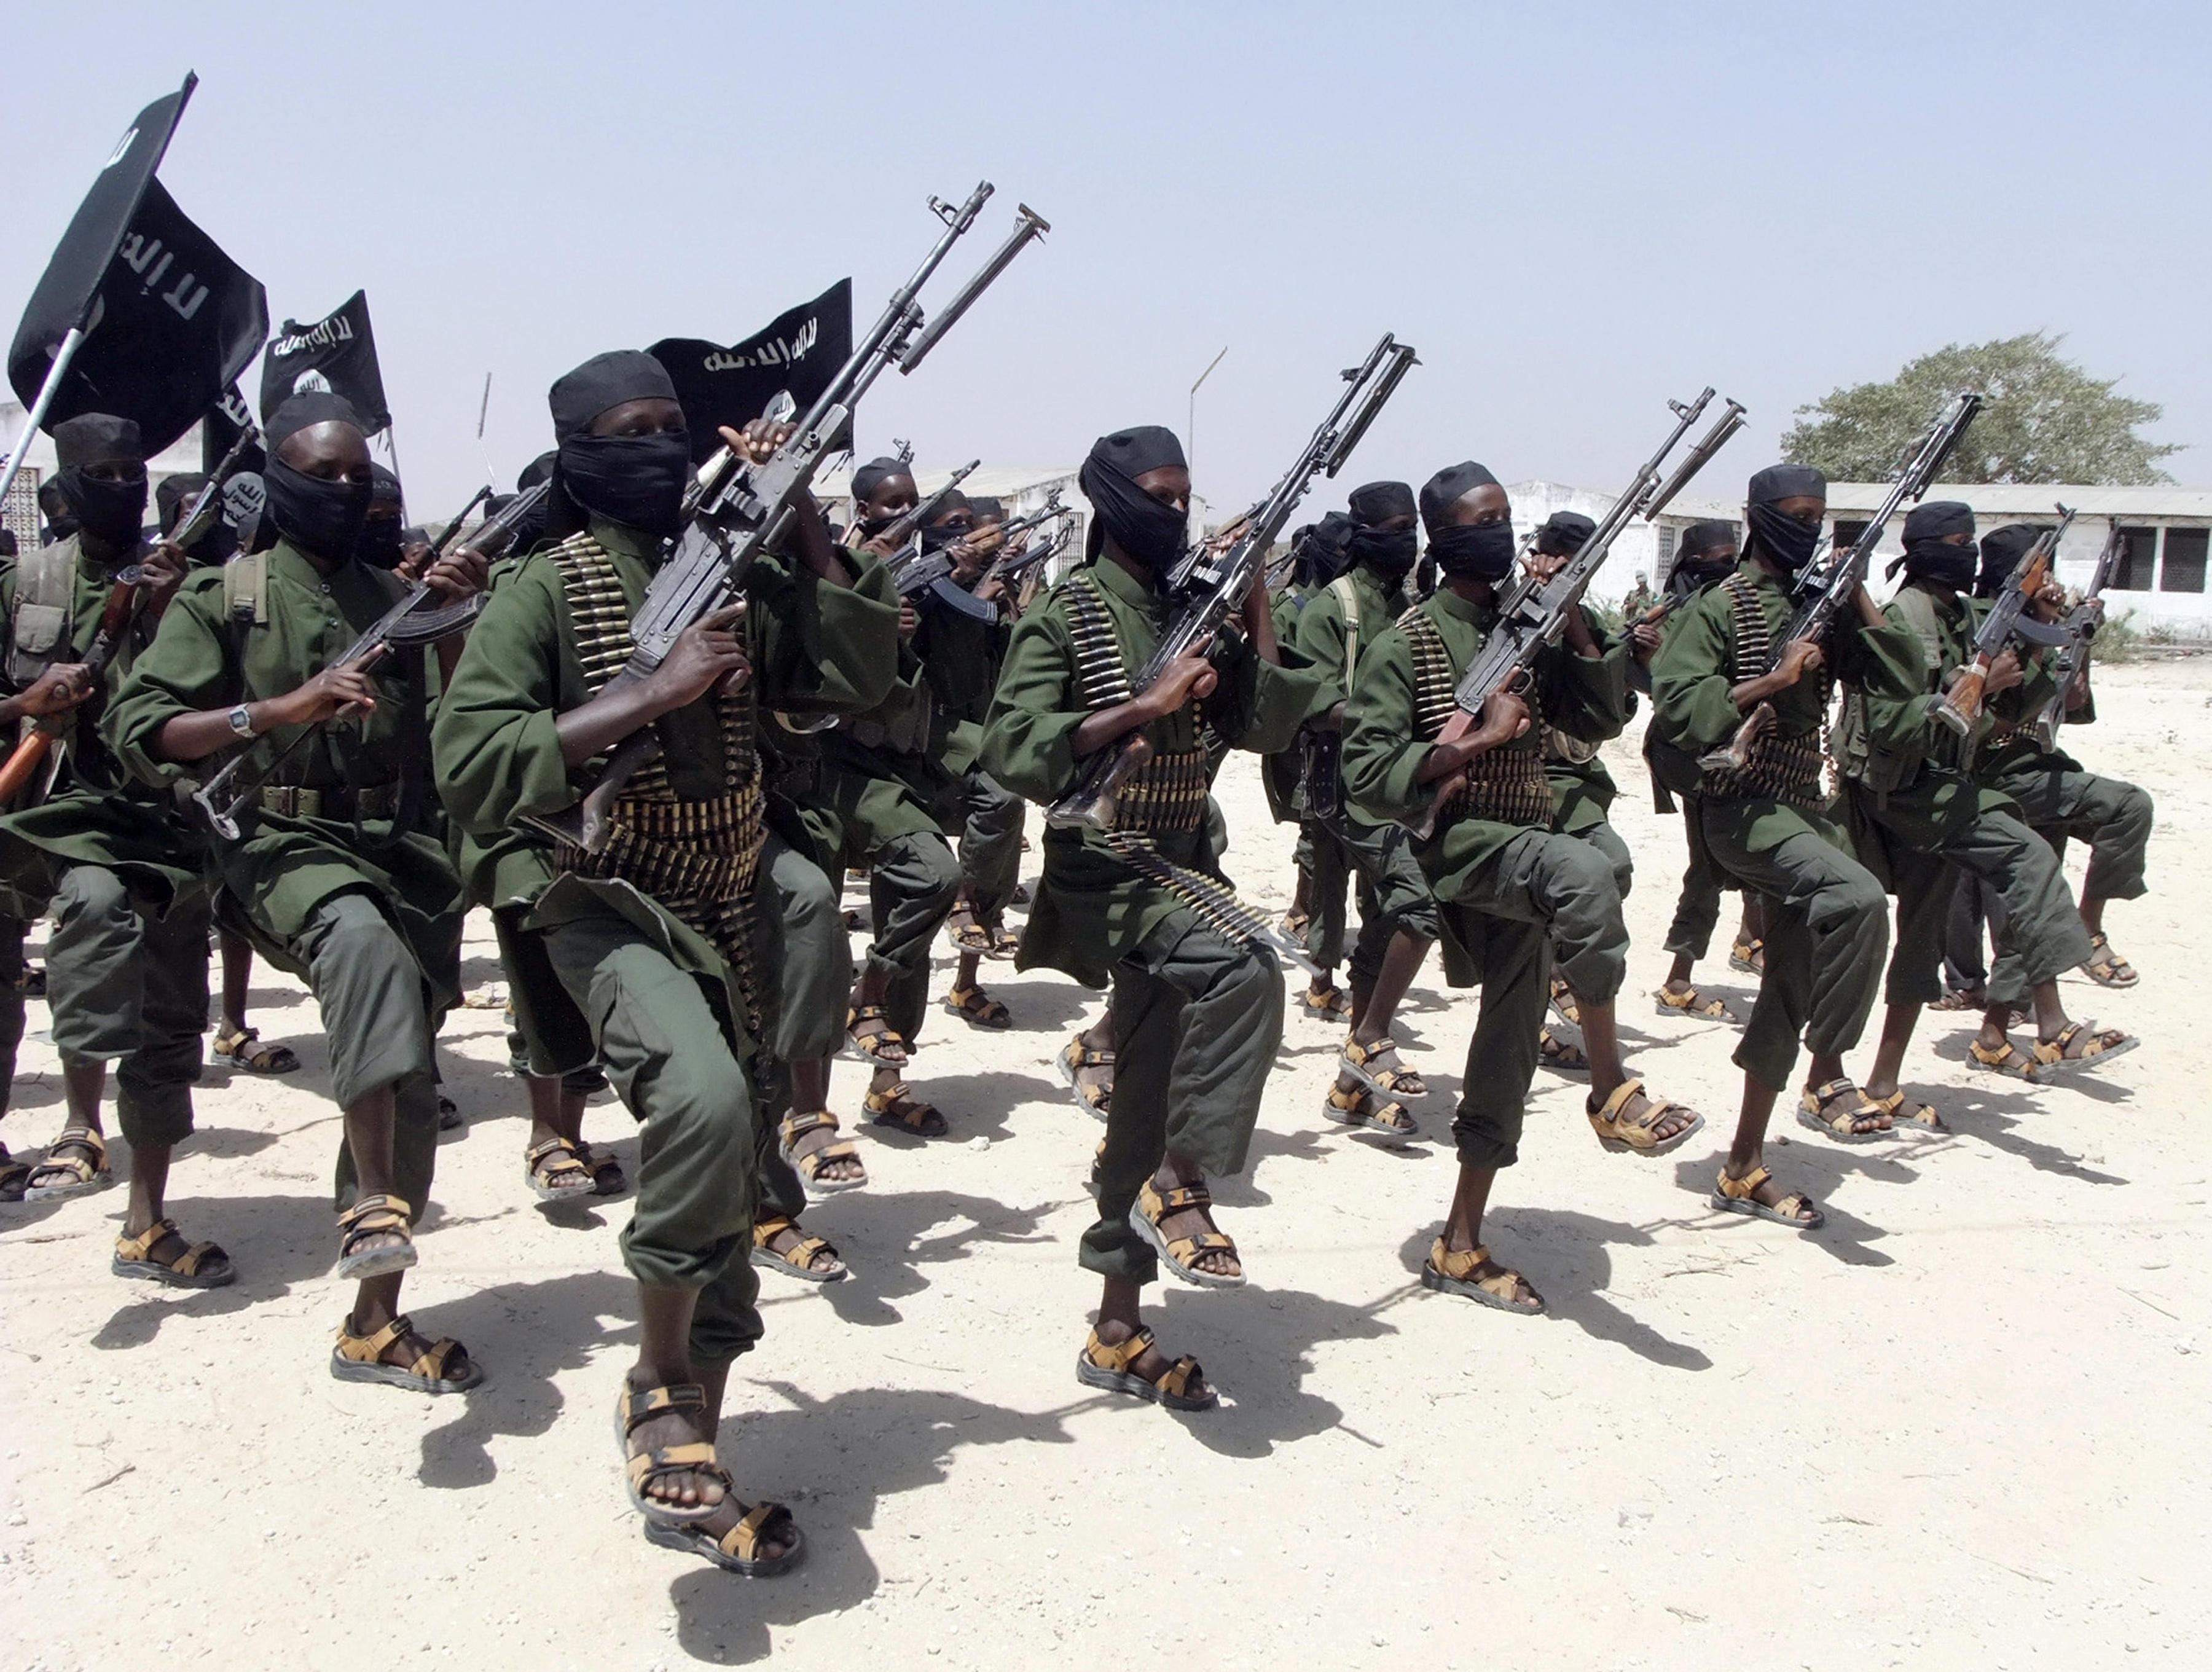 Suspected al-Shabab associate captured in U.S.-Somali raid